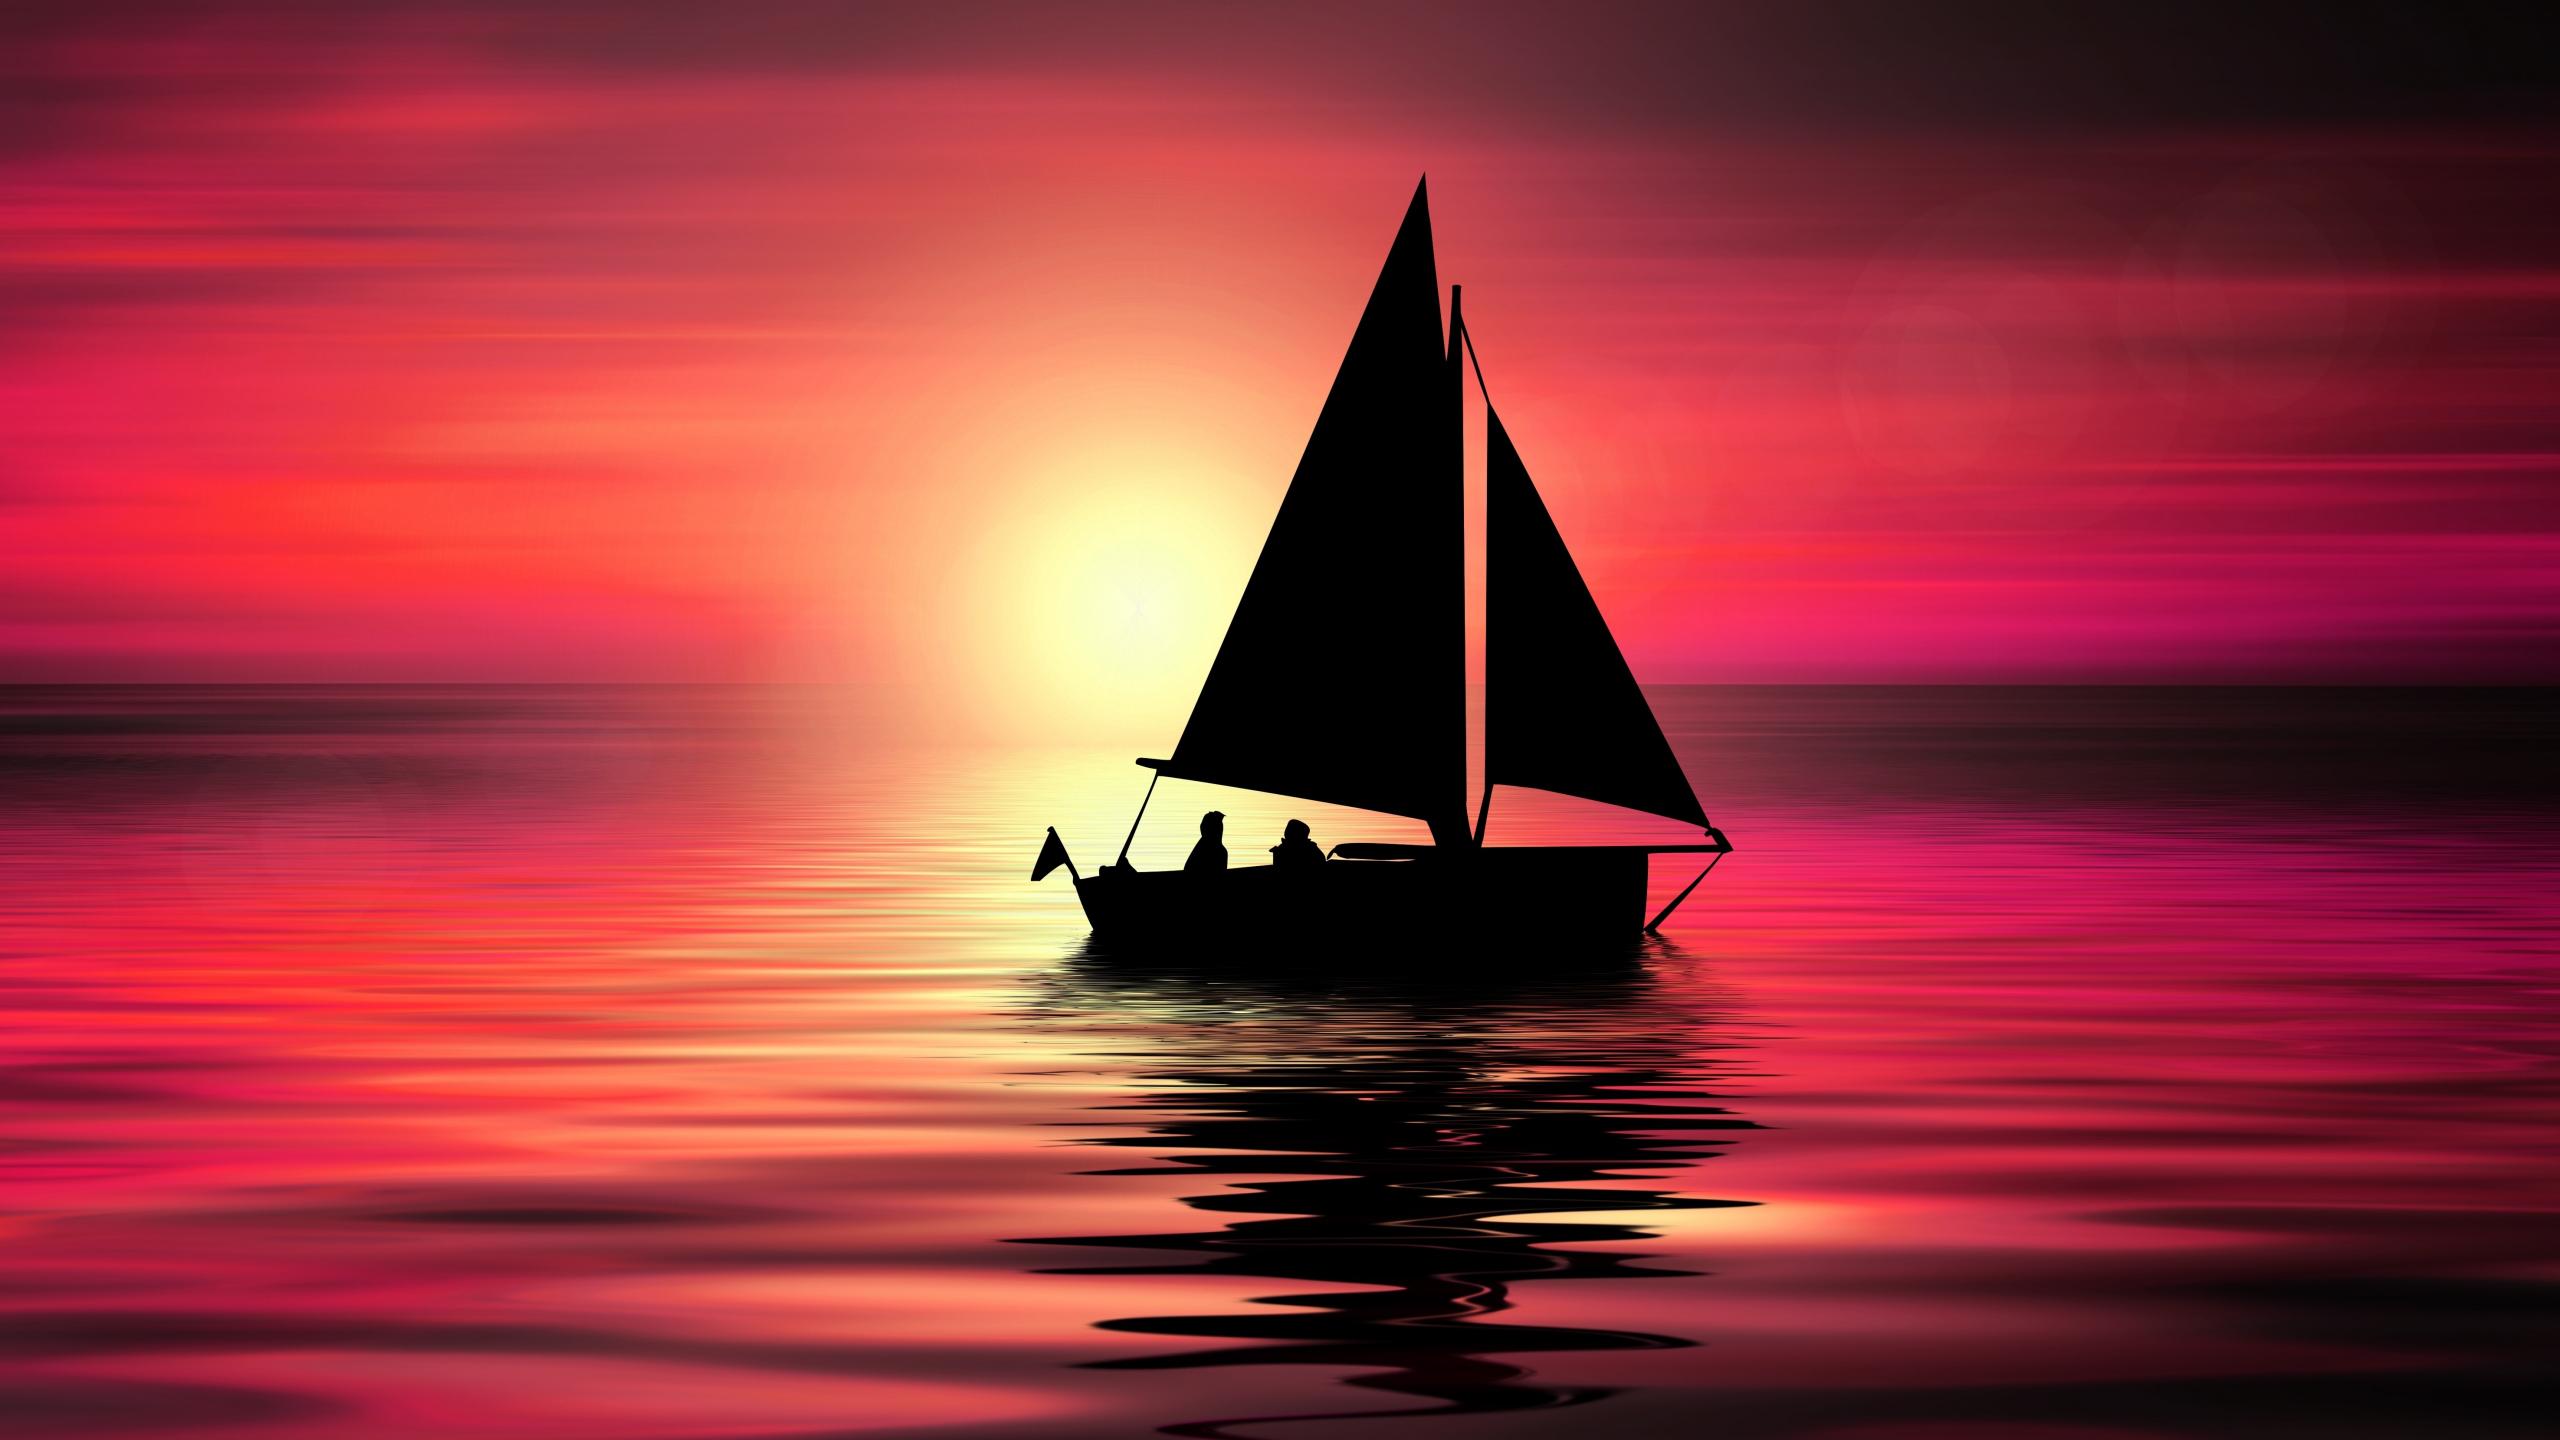 Artwork, sailboat, sunset, silhouette, 2560x1440 wallpaper